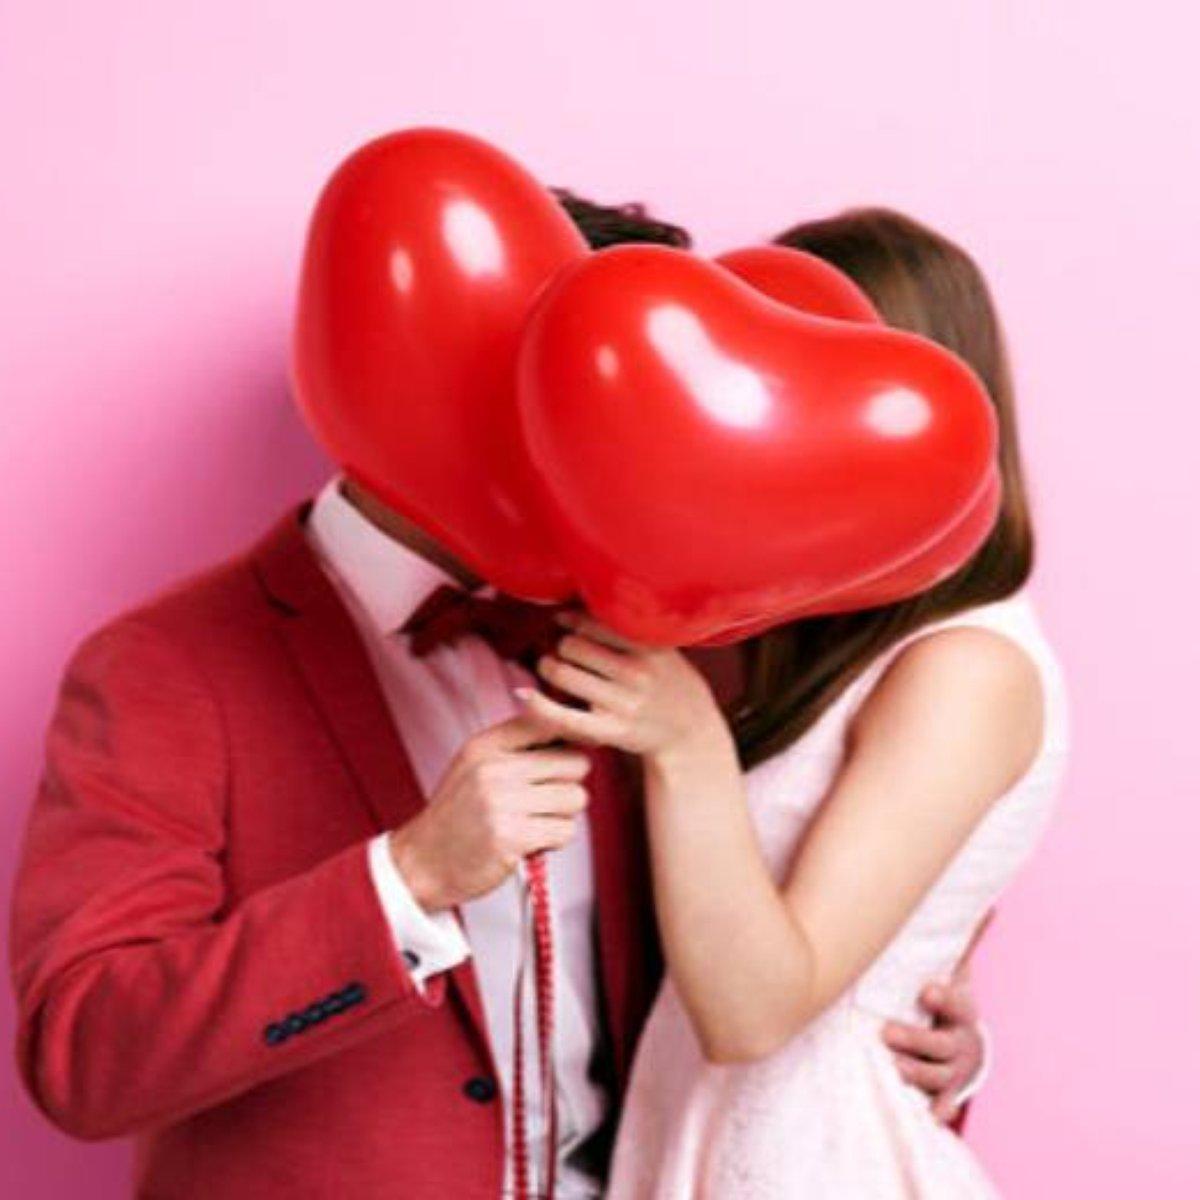 Dia dos Namorados na pandemia? Ainda dá para comemorar!